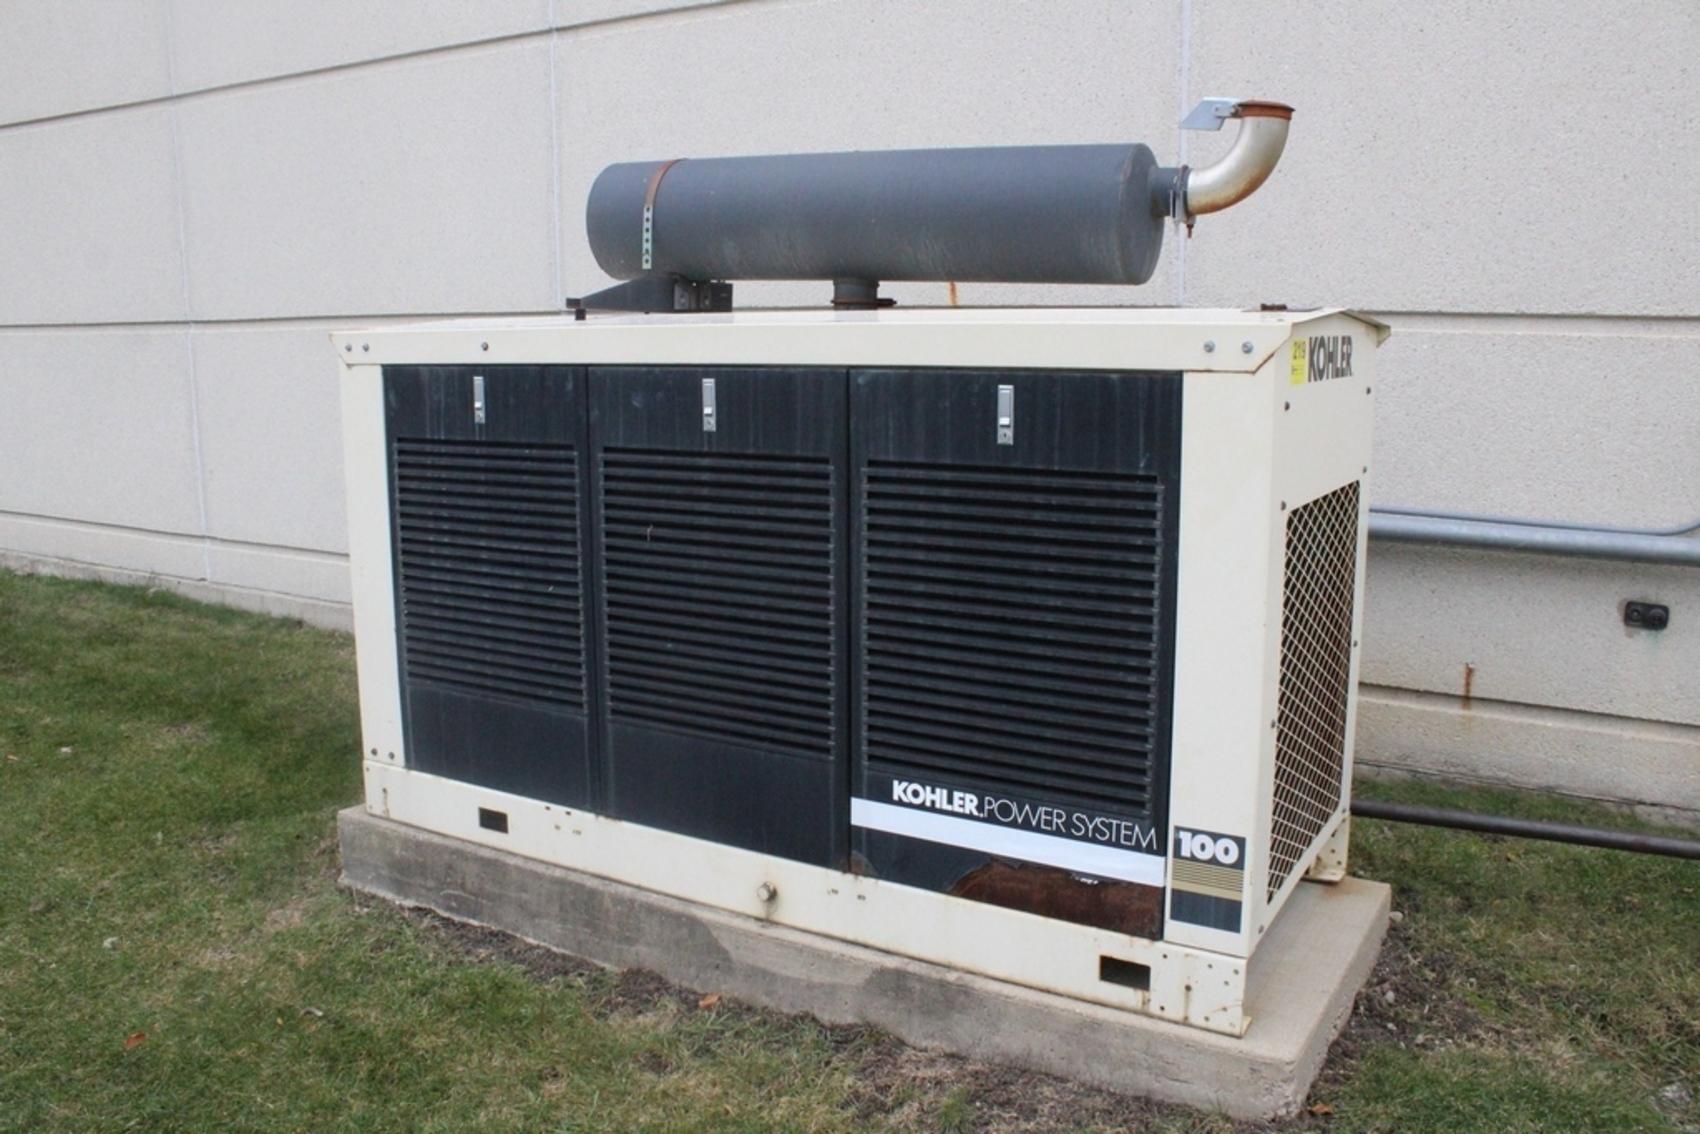 KOHLER MODEL 100 100RZ 125 KVA NATURAL GAS FAST RESPONSE GENERATOR.